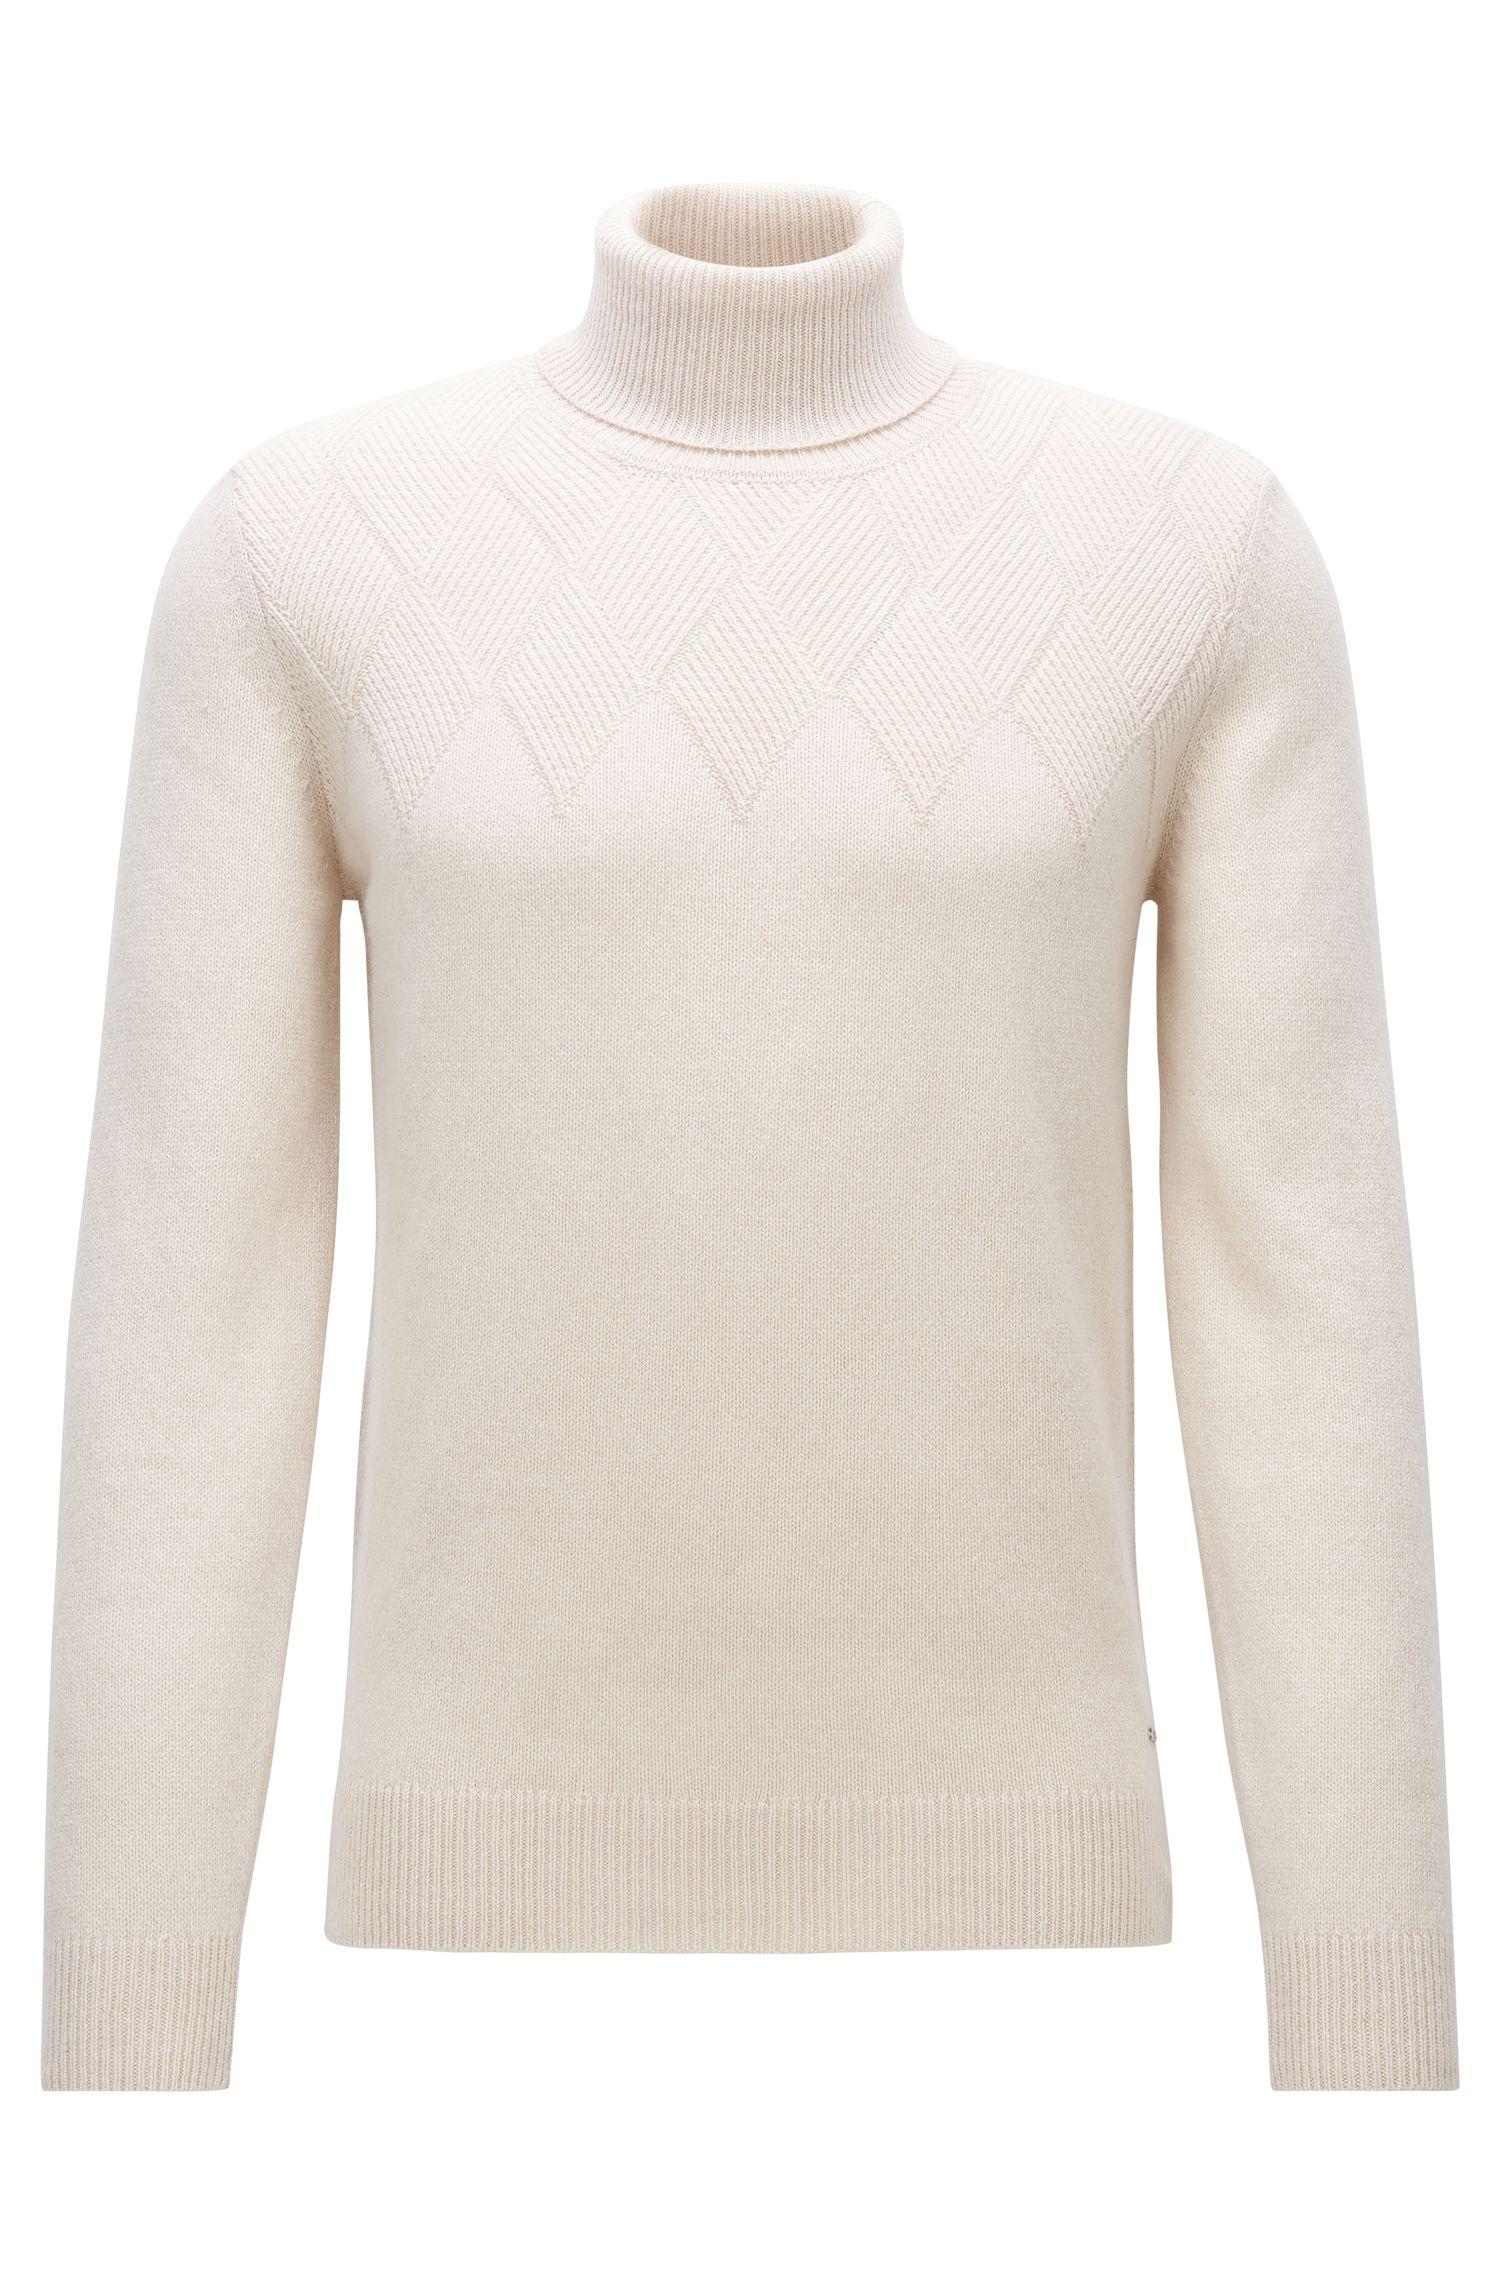 'T-Nuvolino' | Cashmere-Wool Turtleneck Sweater